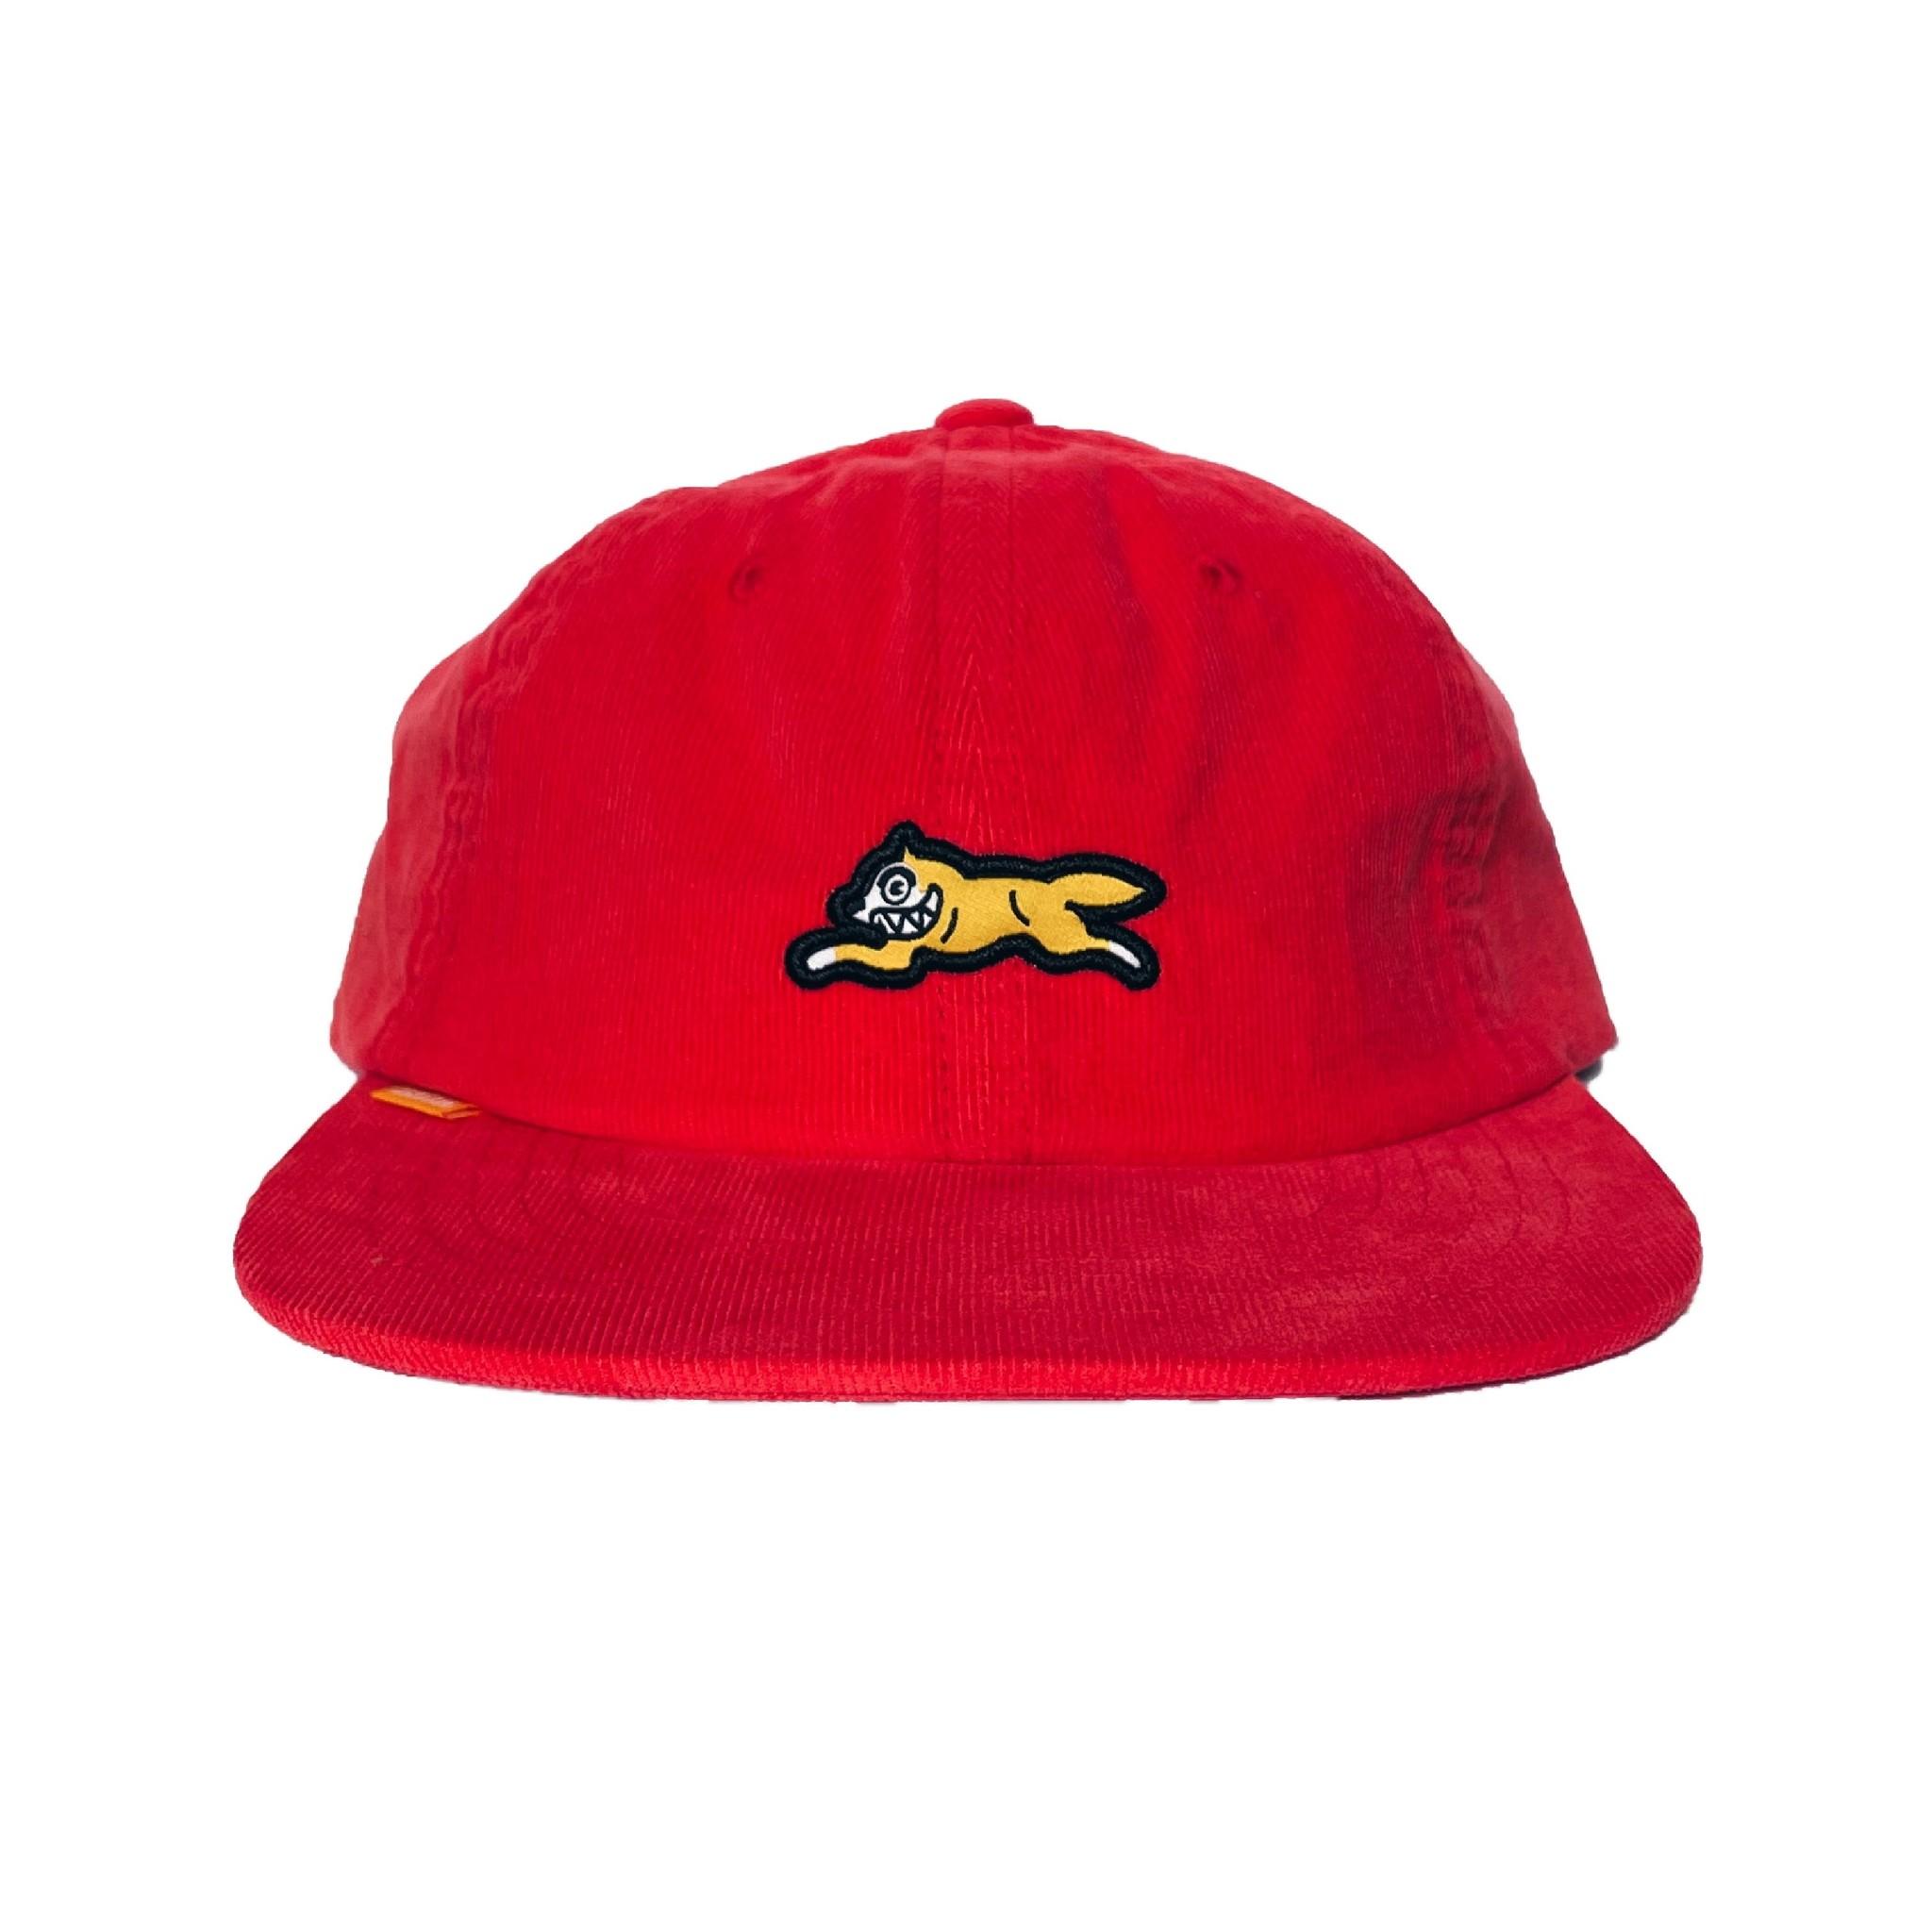 Icecream Icecream Dawg Polo Cap Red